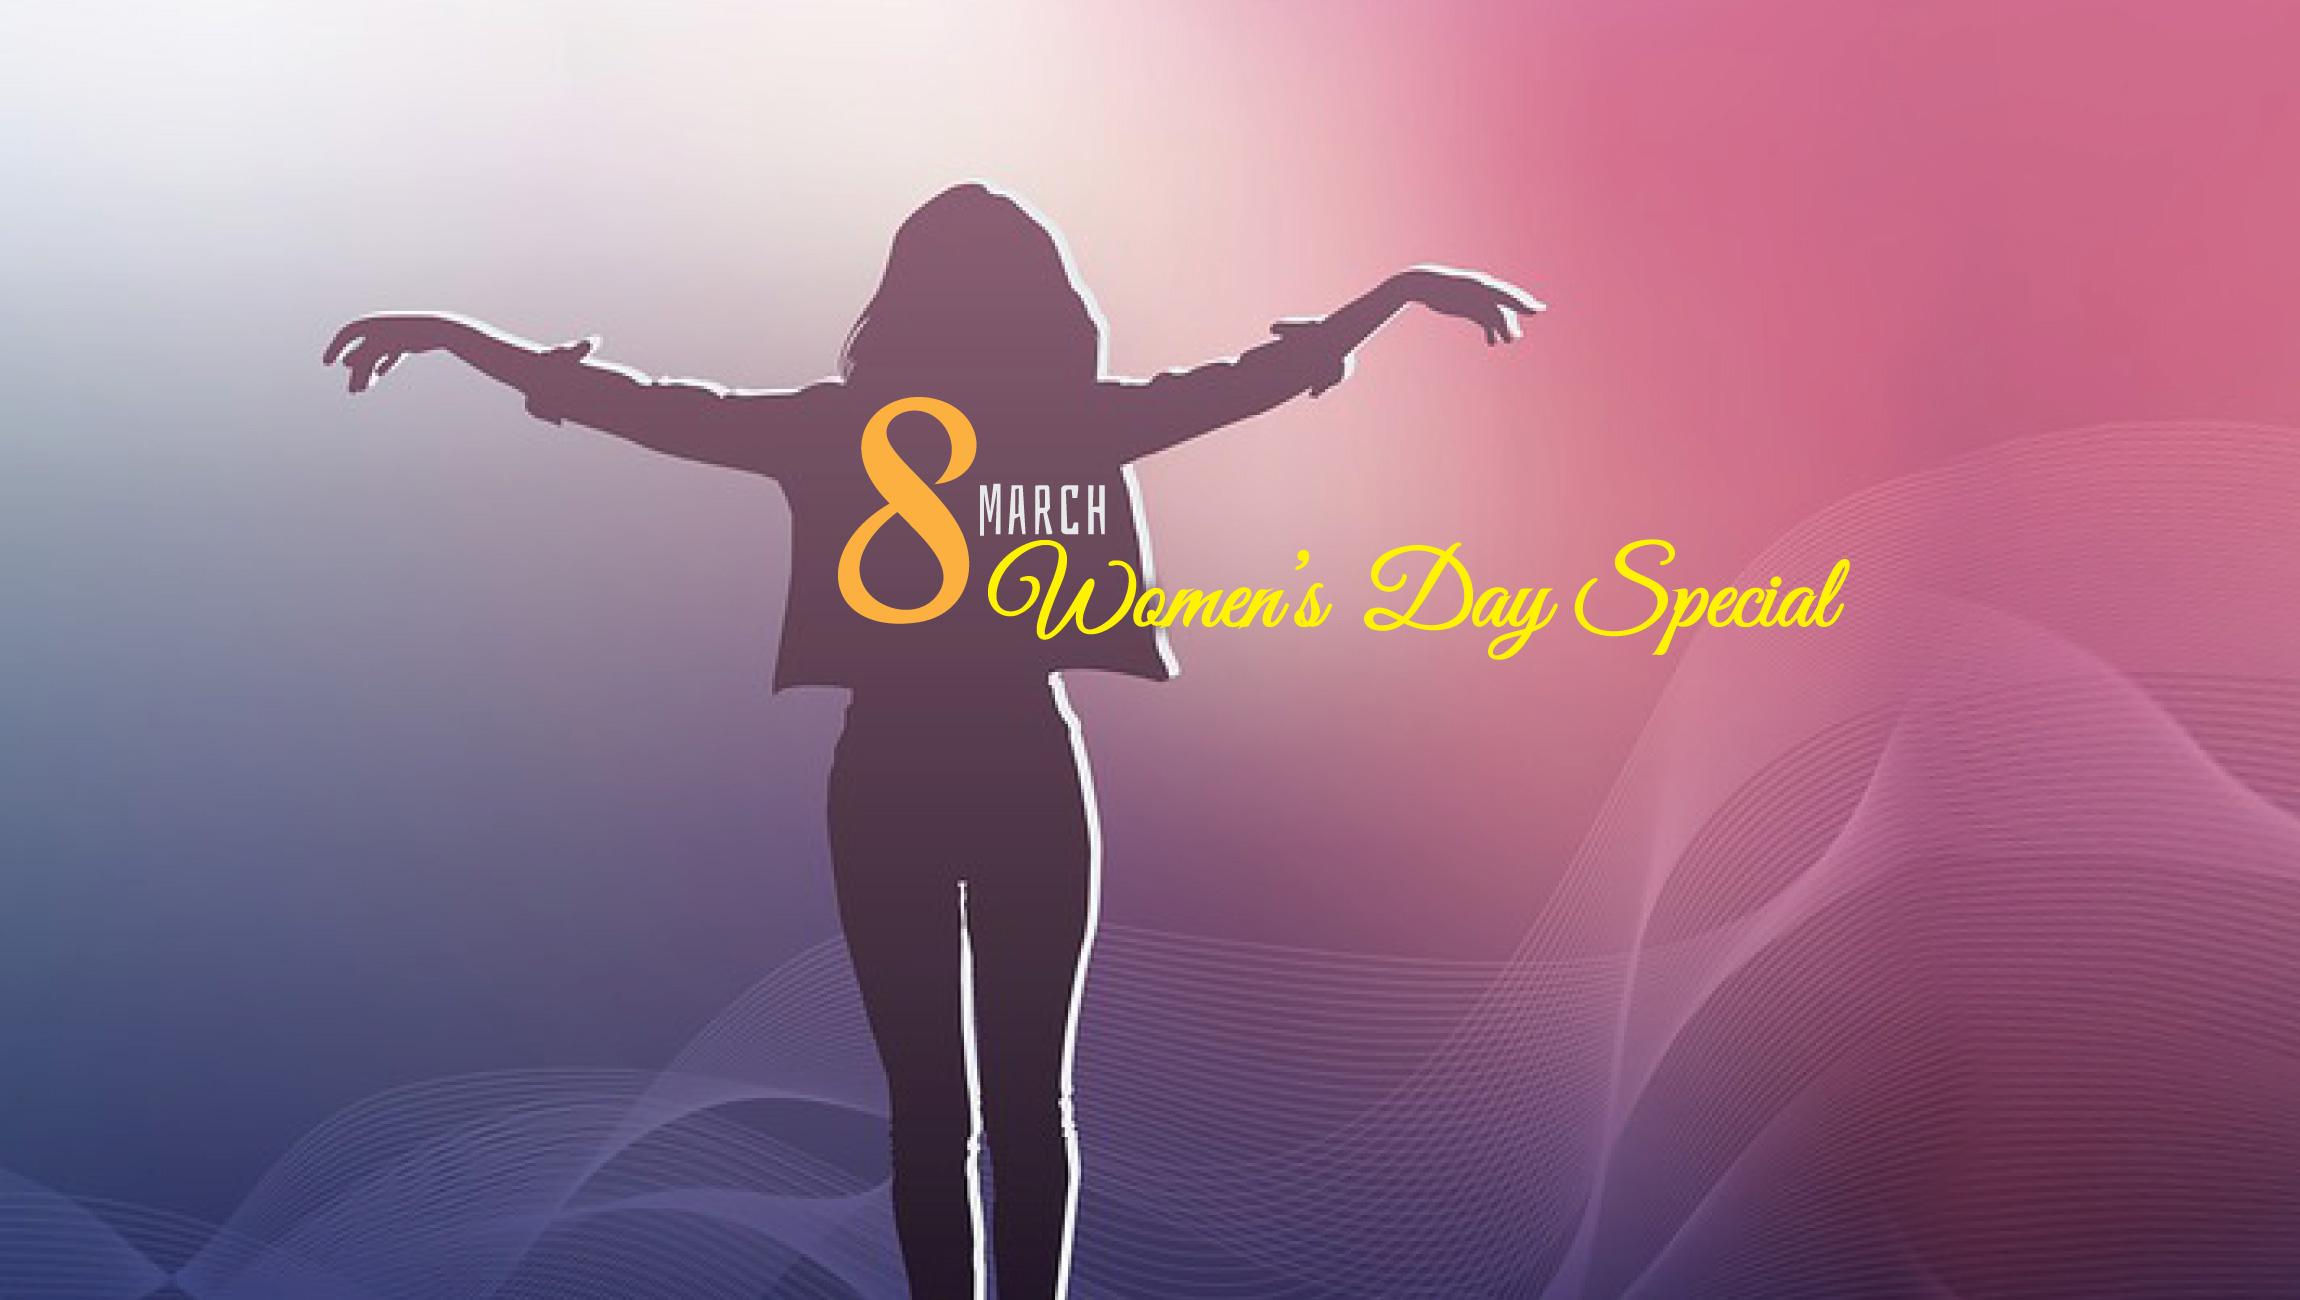 Celebrating The #PowerOfWomen: Top Women in the SalesTech Industry You Should Follow